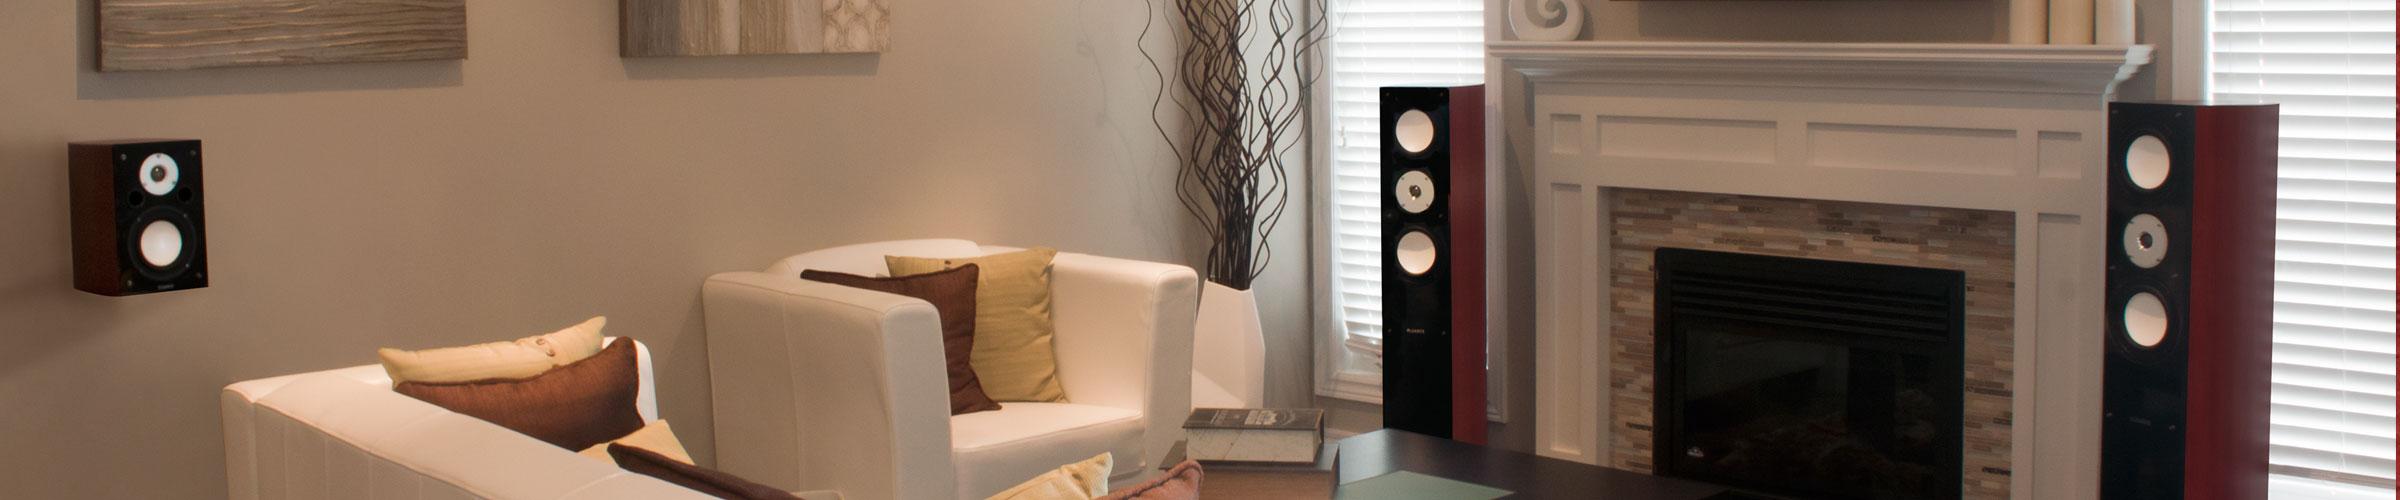 XL7F Floorstanding Speakers Intro